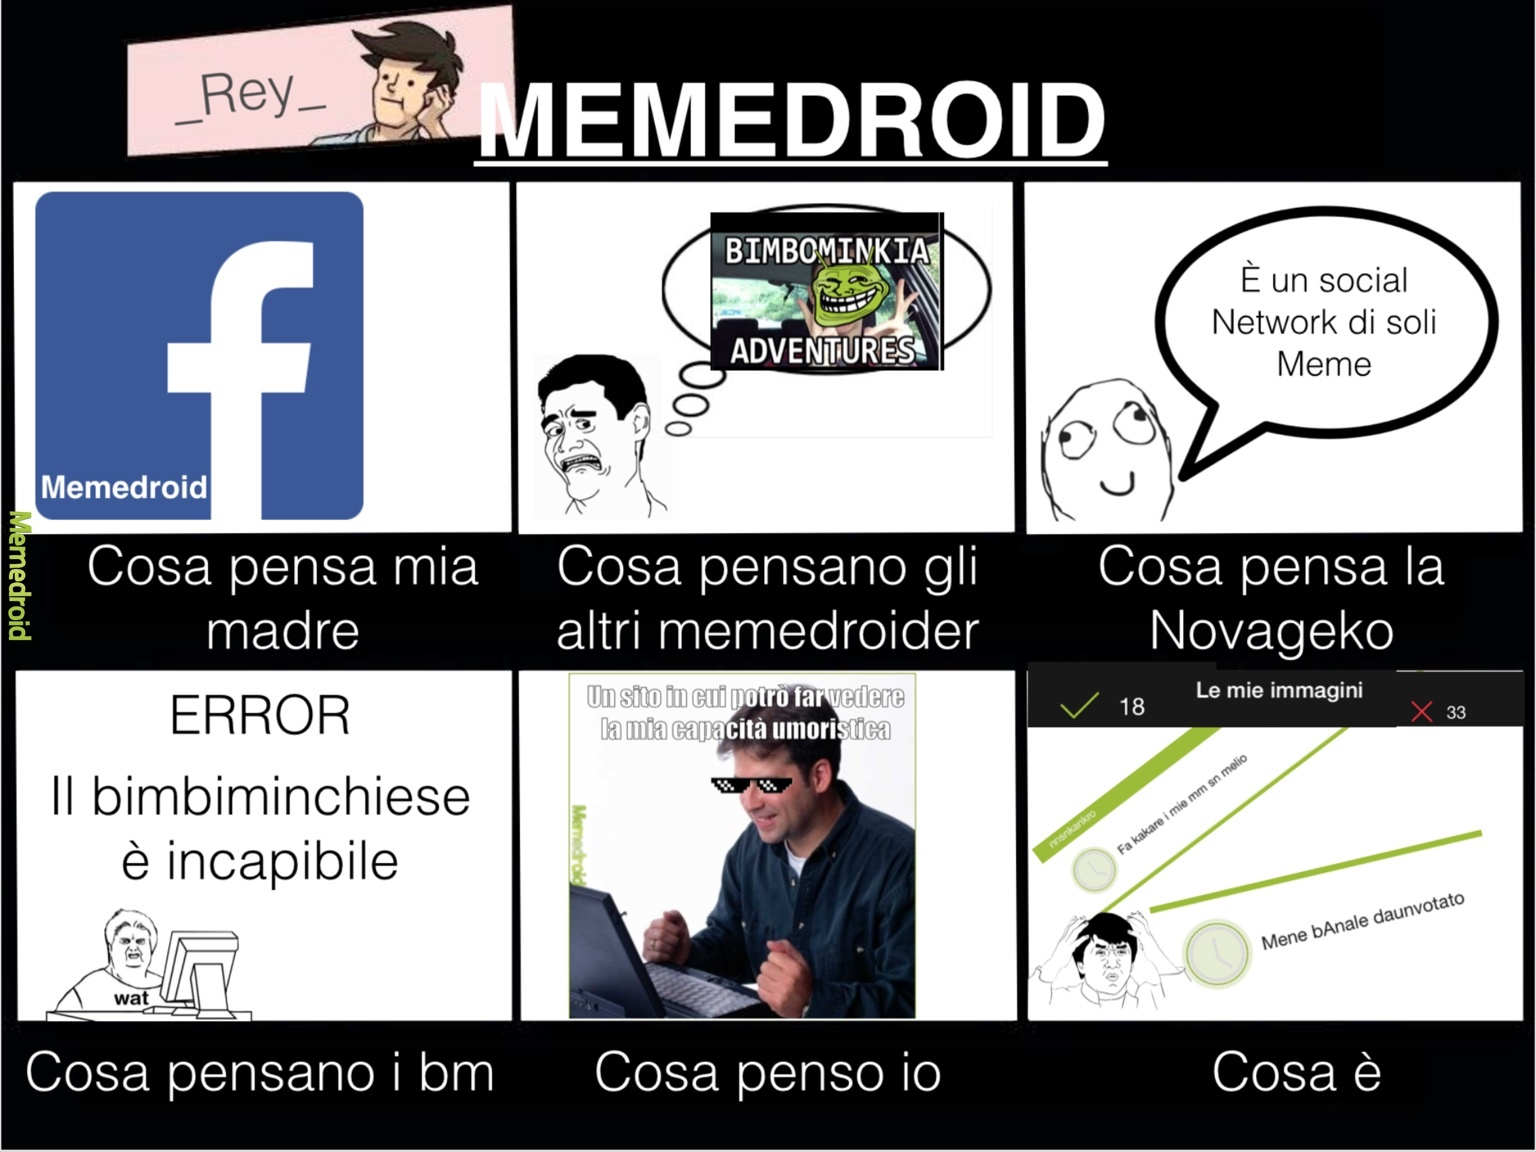 Cito Percy15 - meme